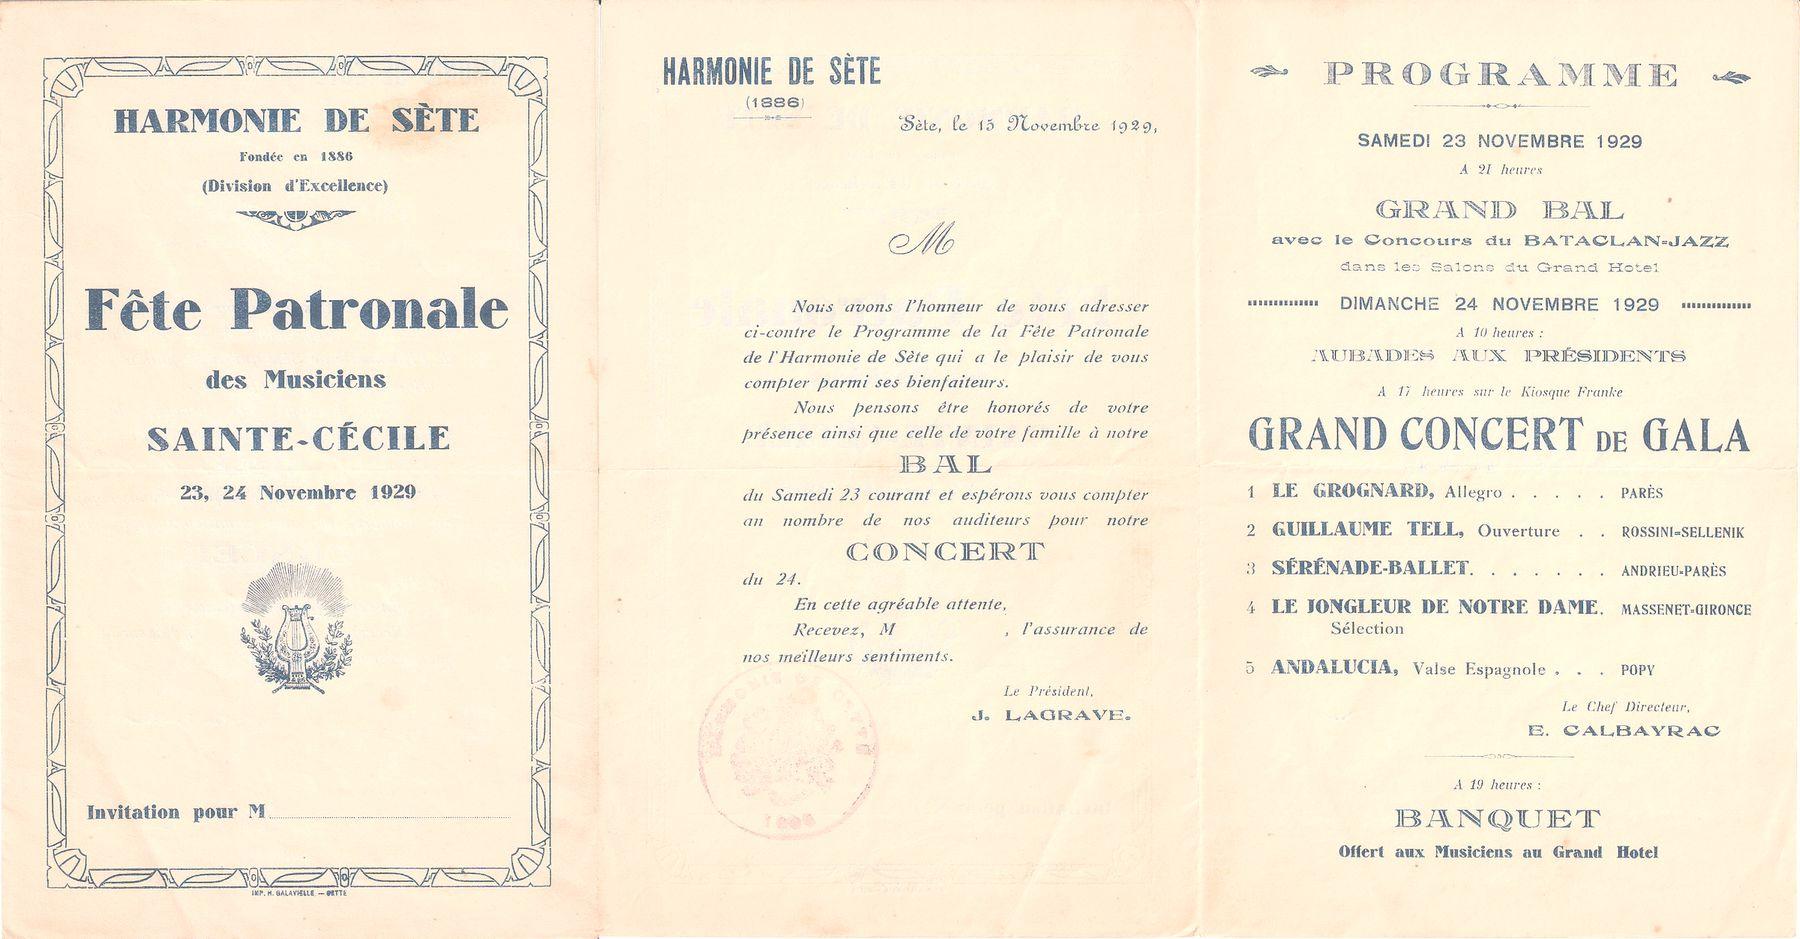 Programme de la fête patronale en 1929